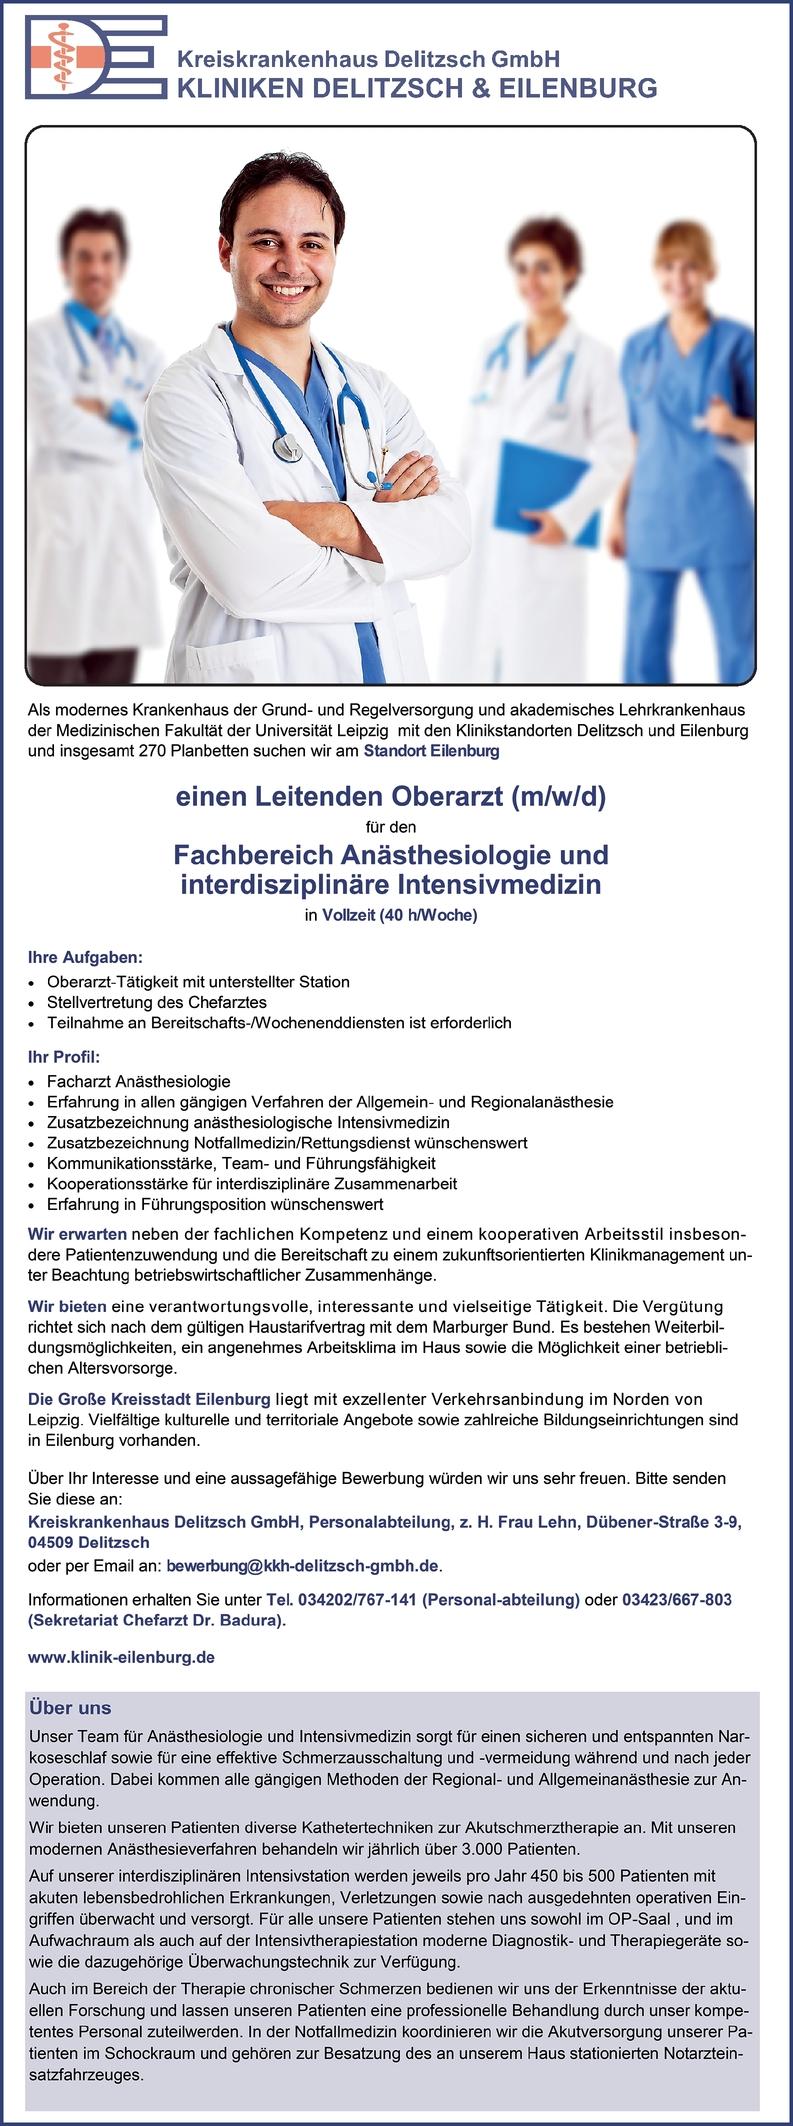 Leitender Oberarzt (m/w/d) Anästhesiologie